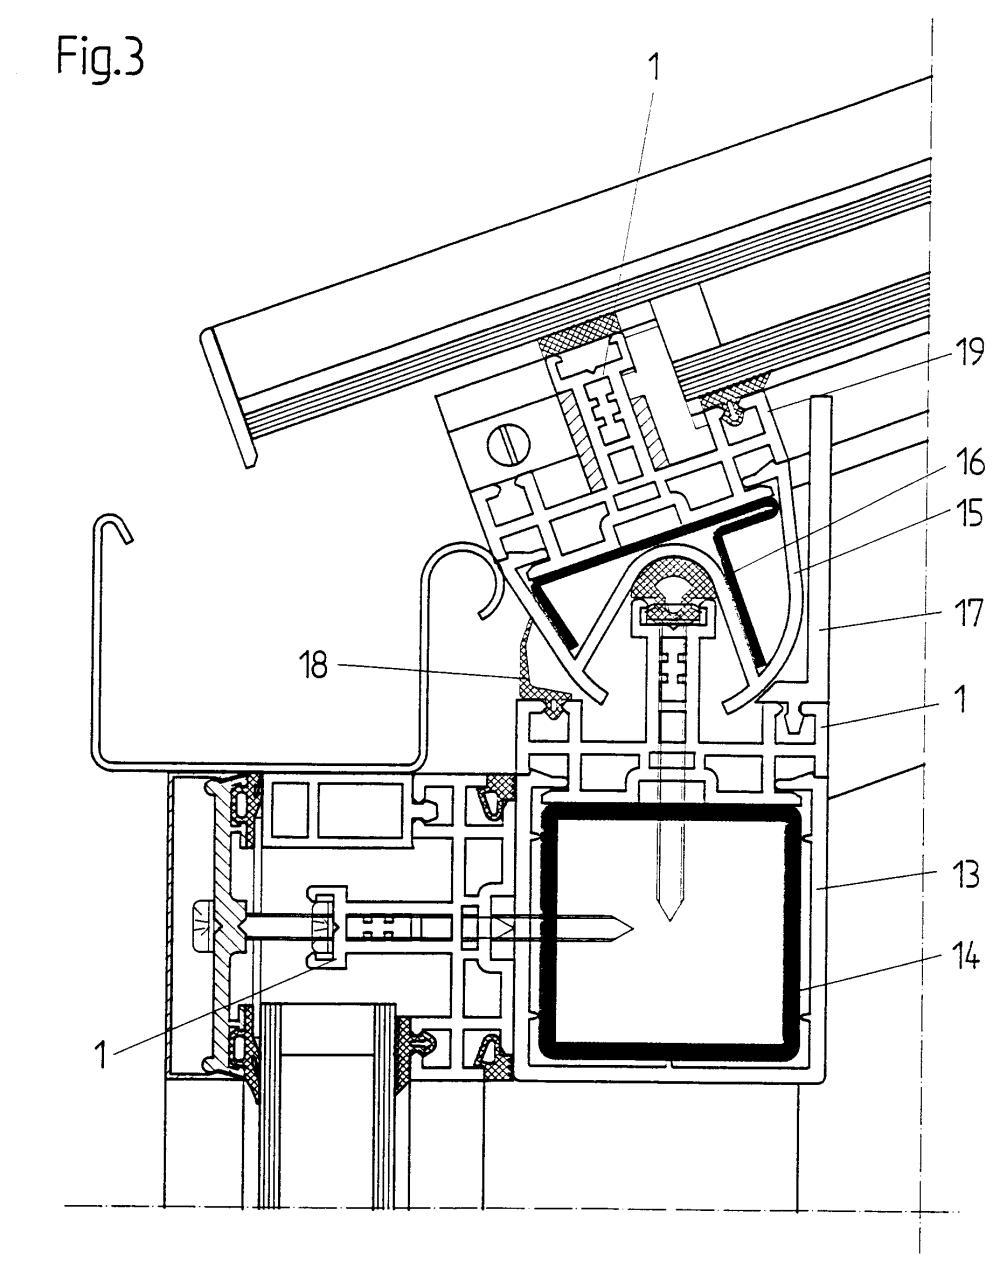 medium resolution of duramax fuel diagram wiring diagram for light switch u2022 filter for 2004 avalanche fuel pump